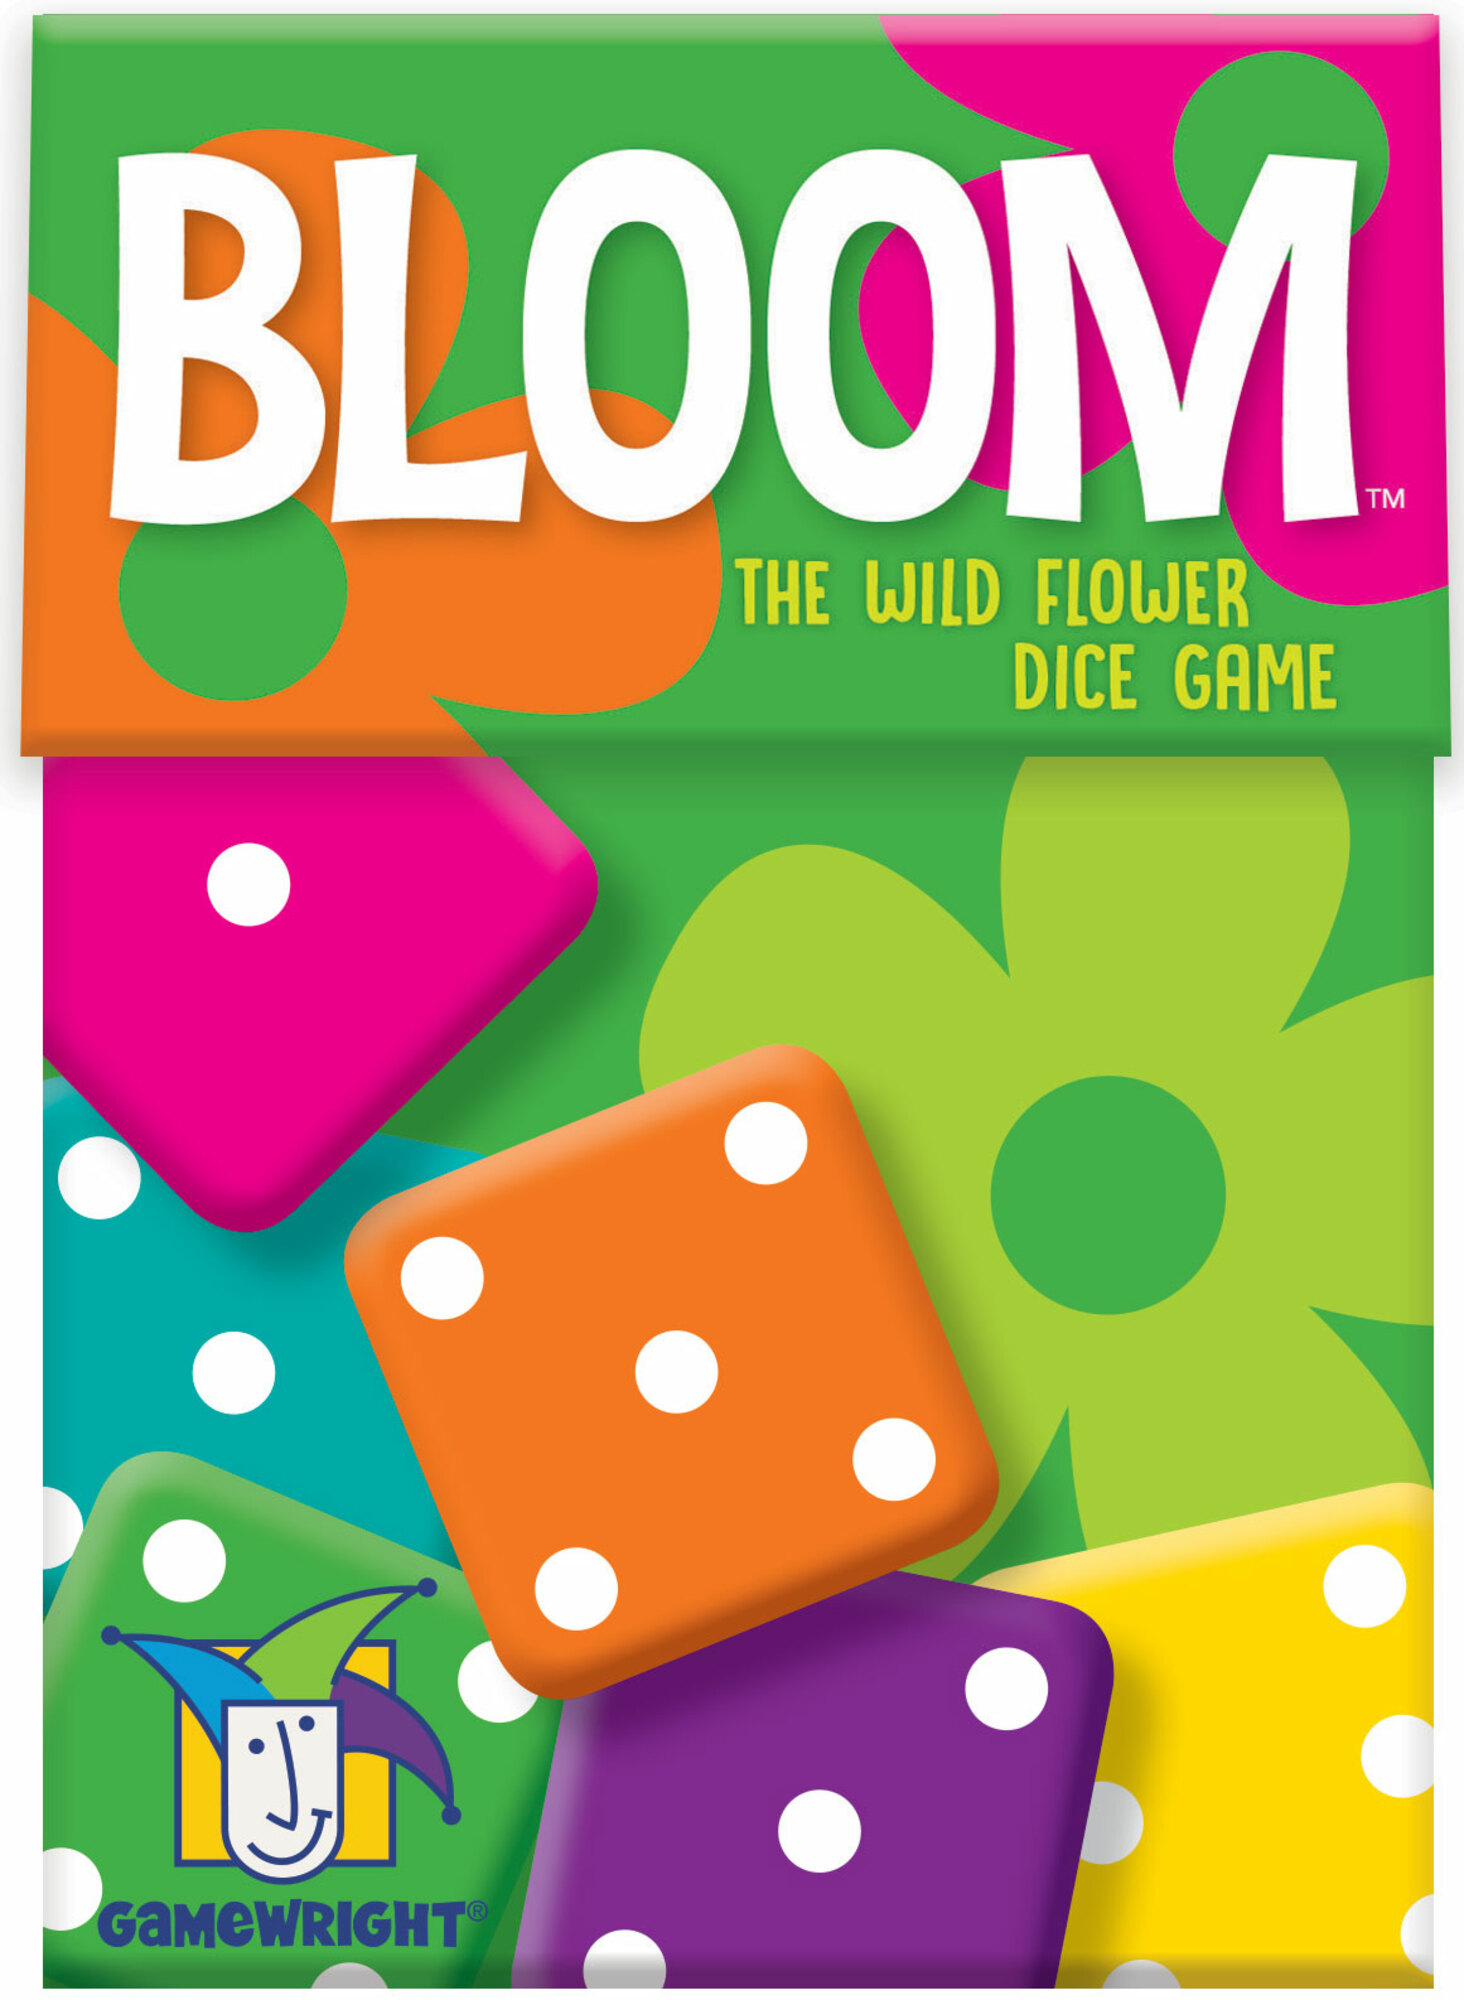 Bloom Gaming